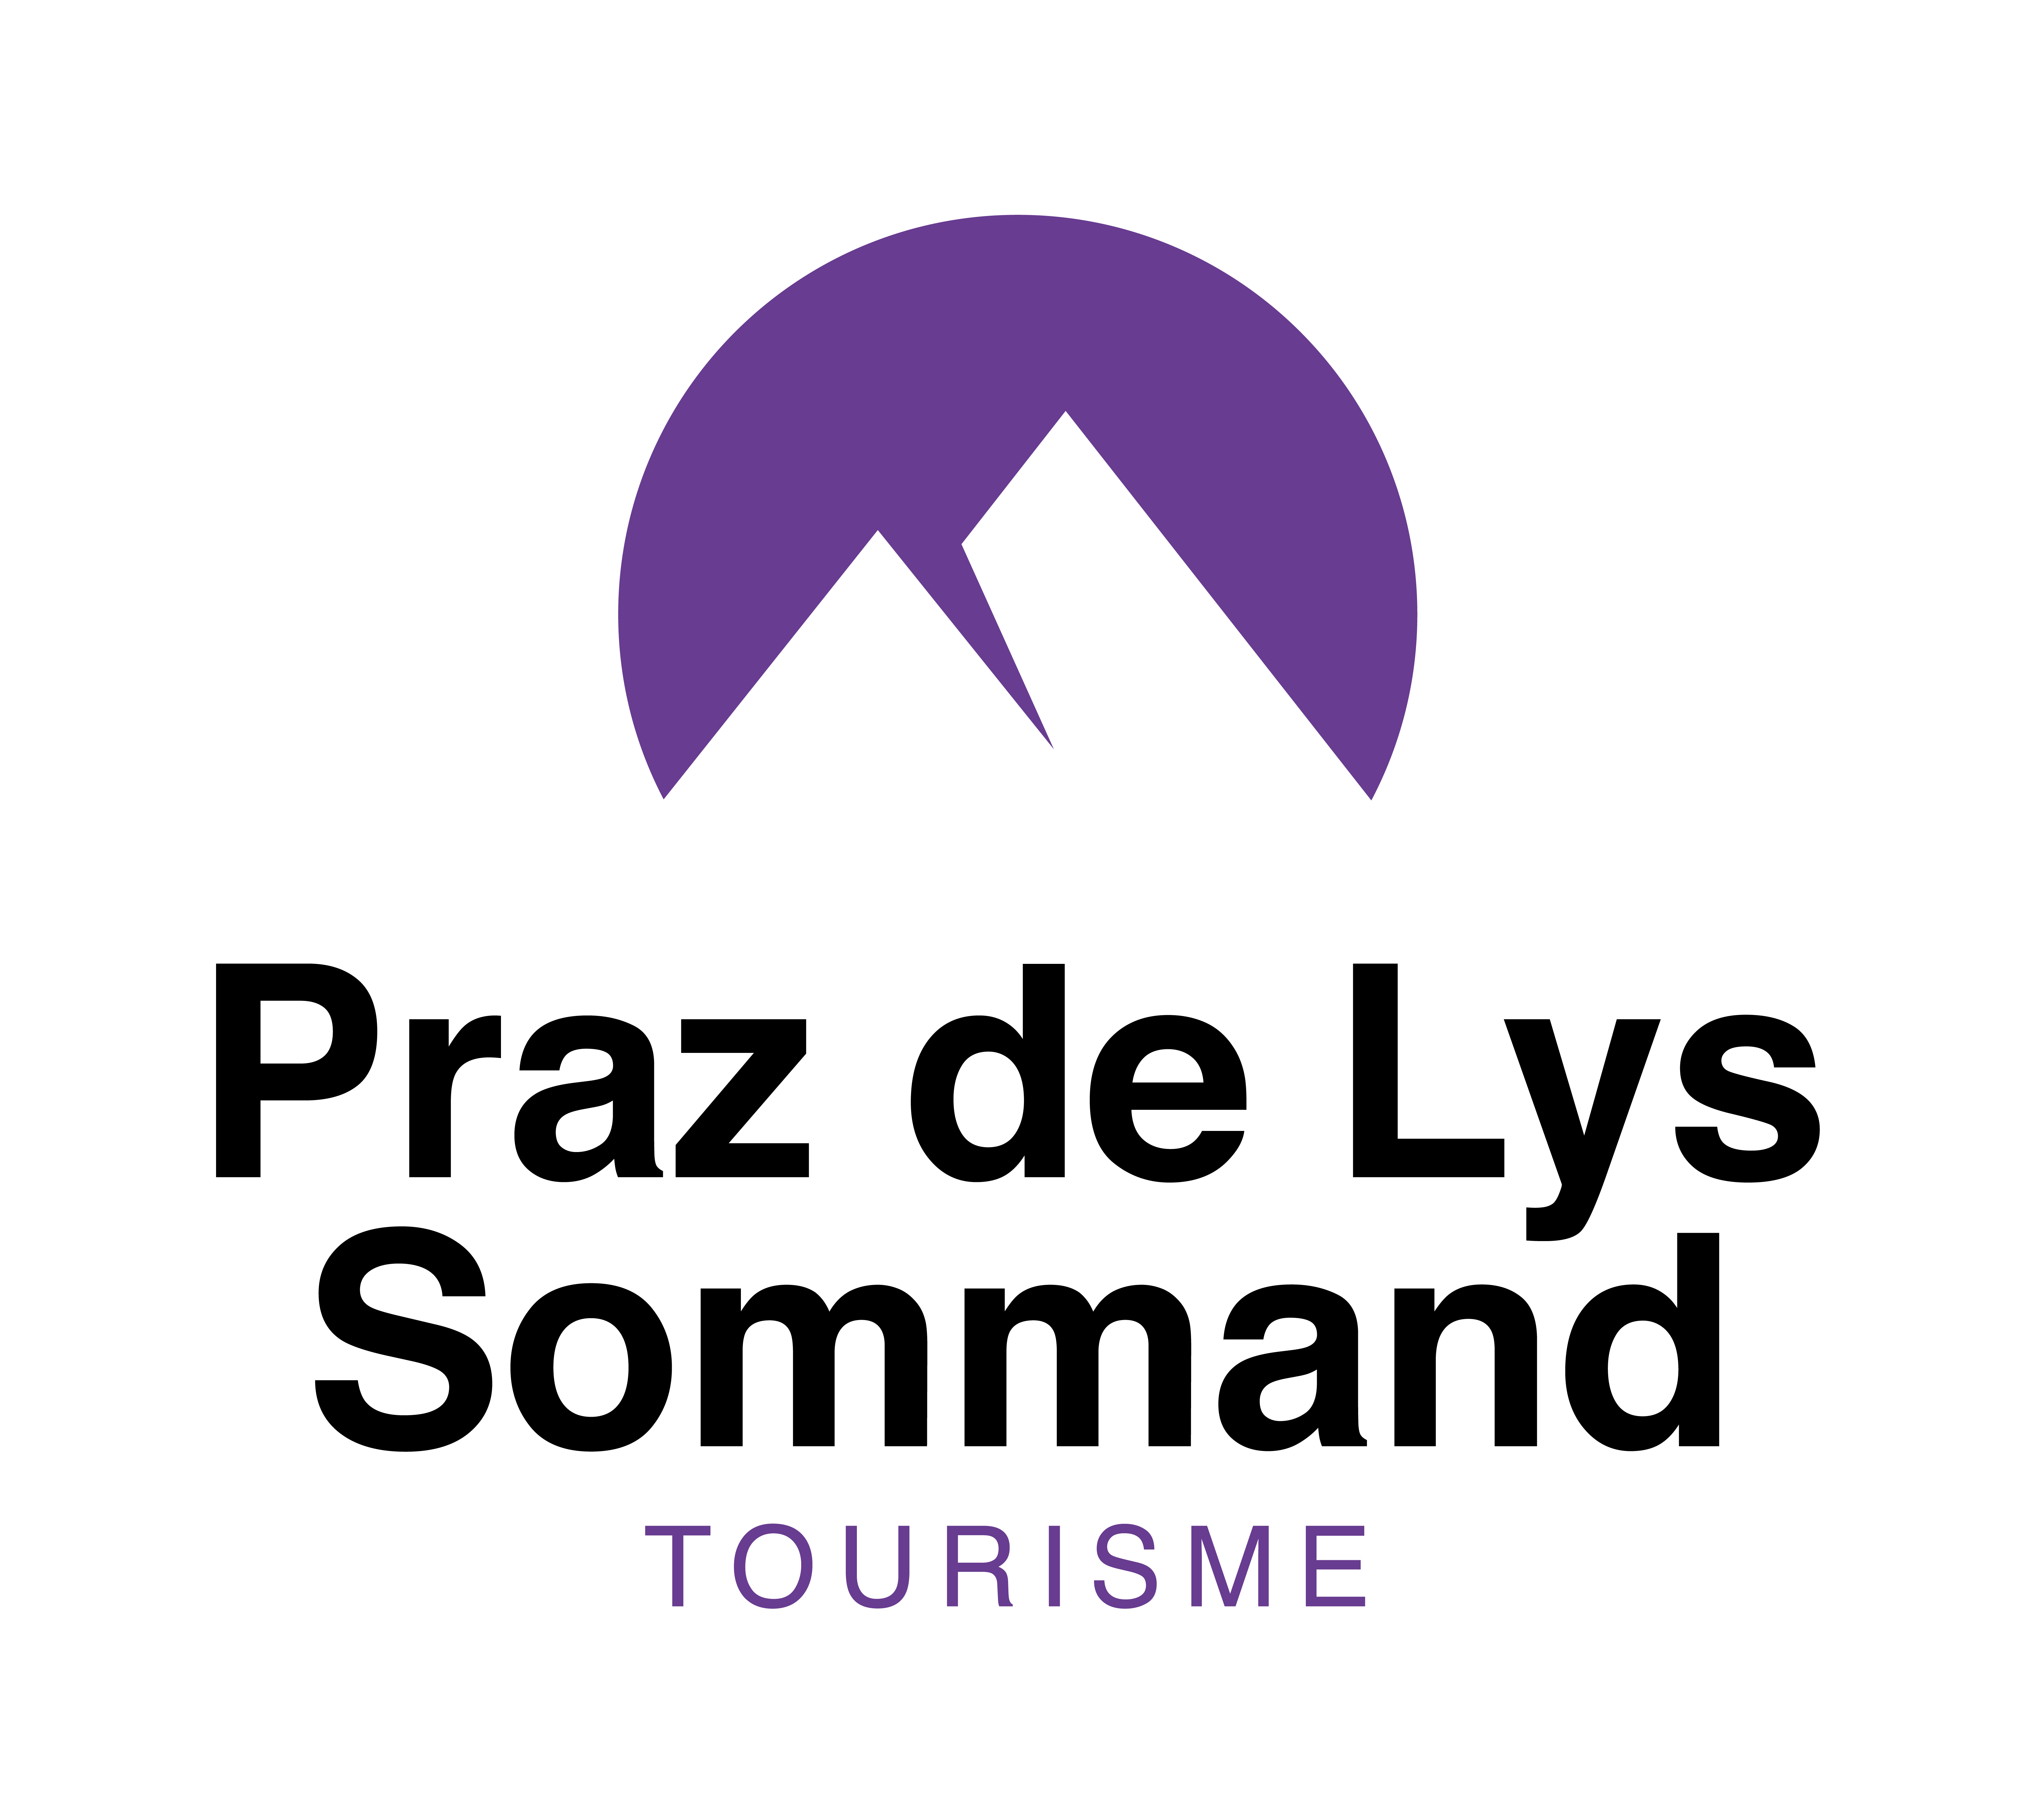 Mieussy Tourist Office